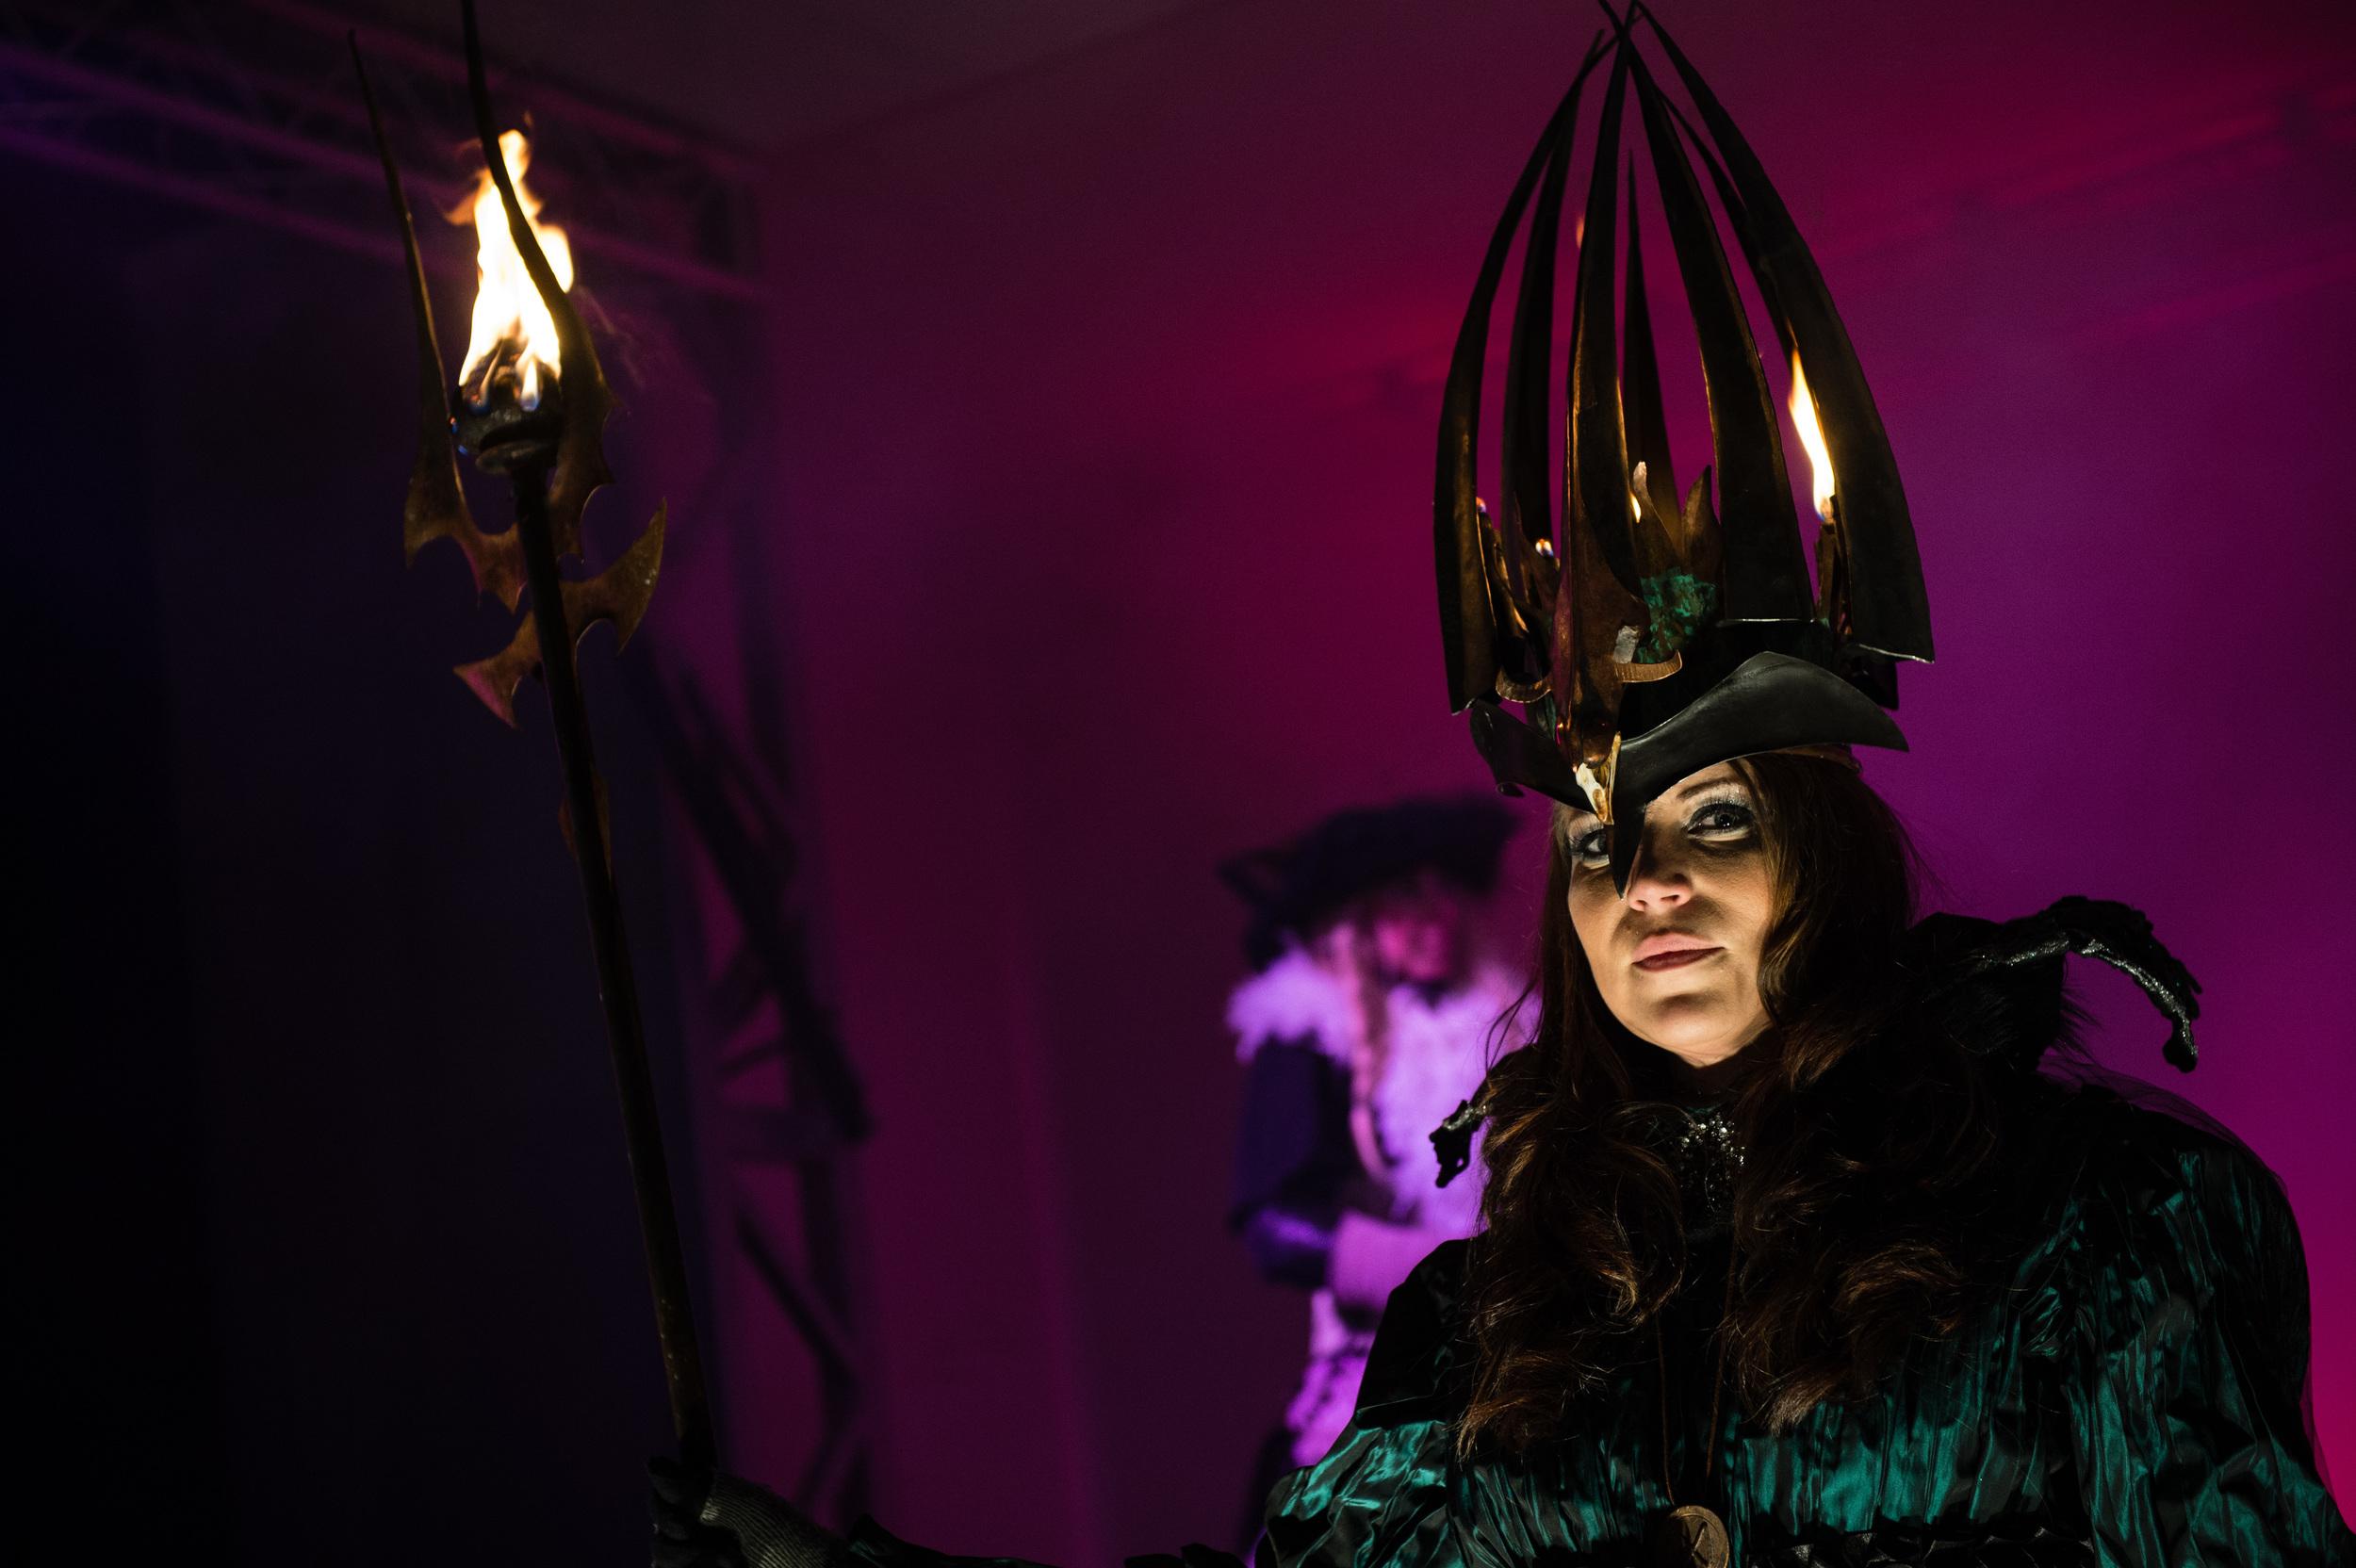 Katarina Borbos gestaltar vår Lucia i folktron på Midvinterglöd 2014. Foto: Philippe Rendu www.philippe.se